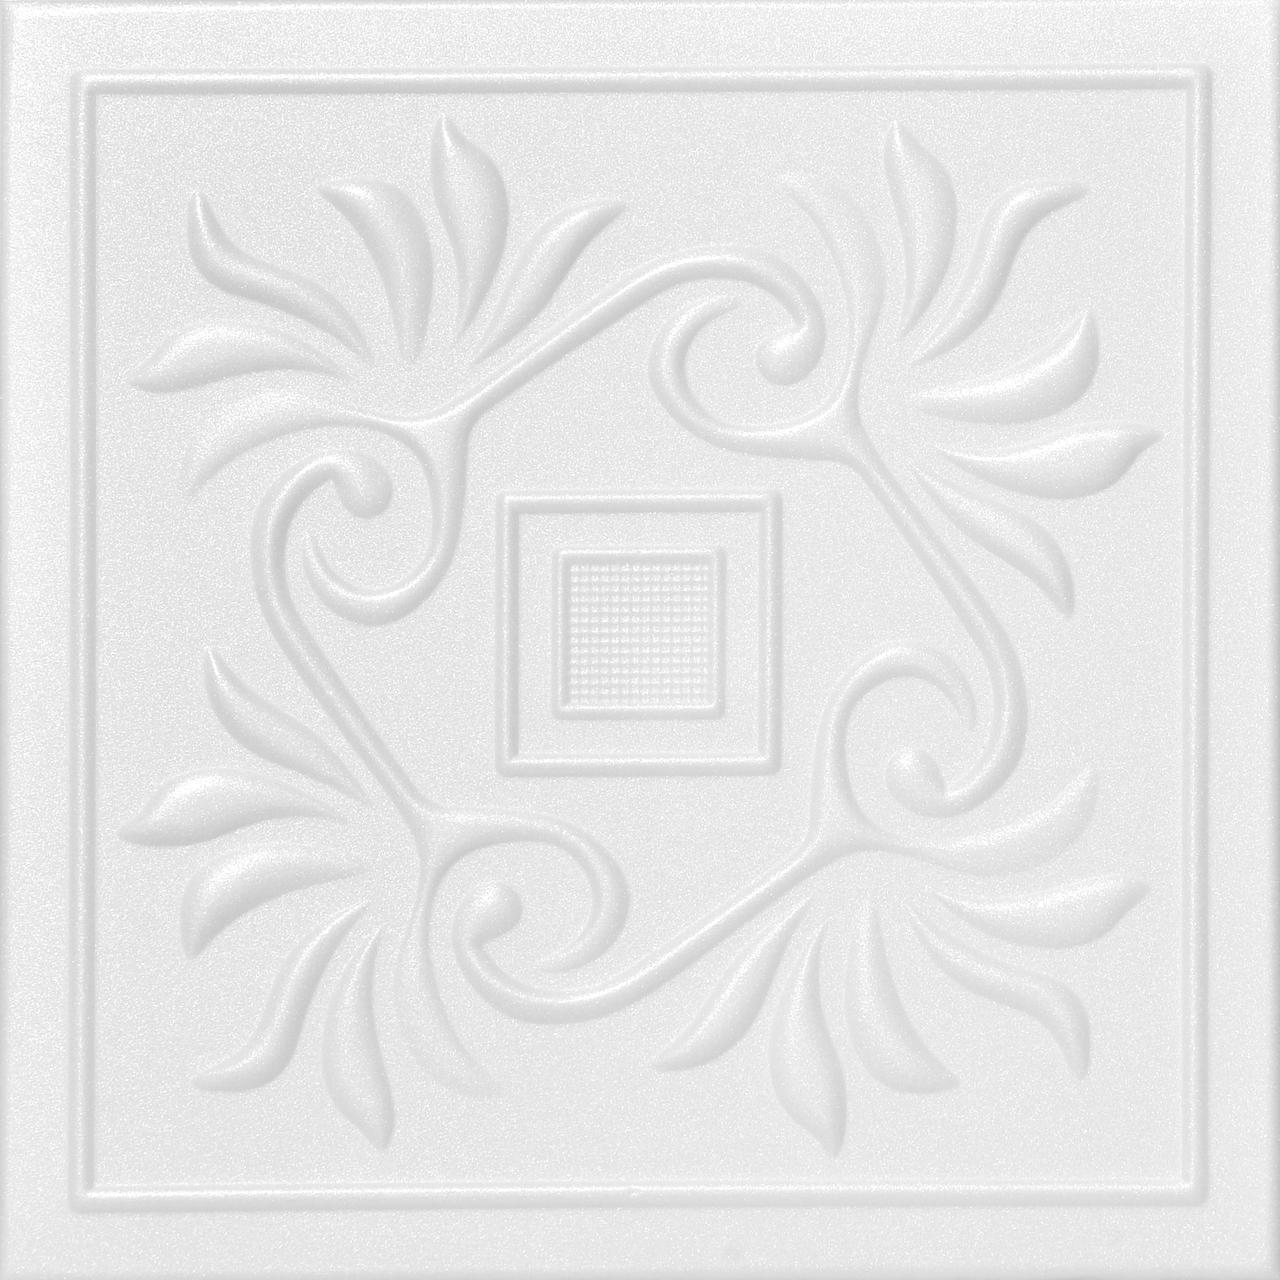 50 off on painting service styrofoam dailygadgetfo Choice Image